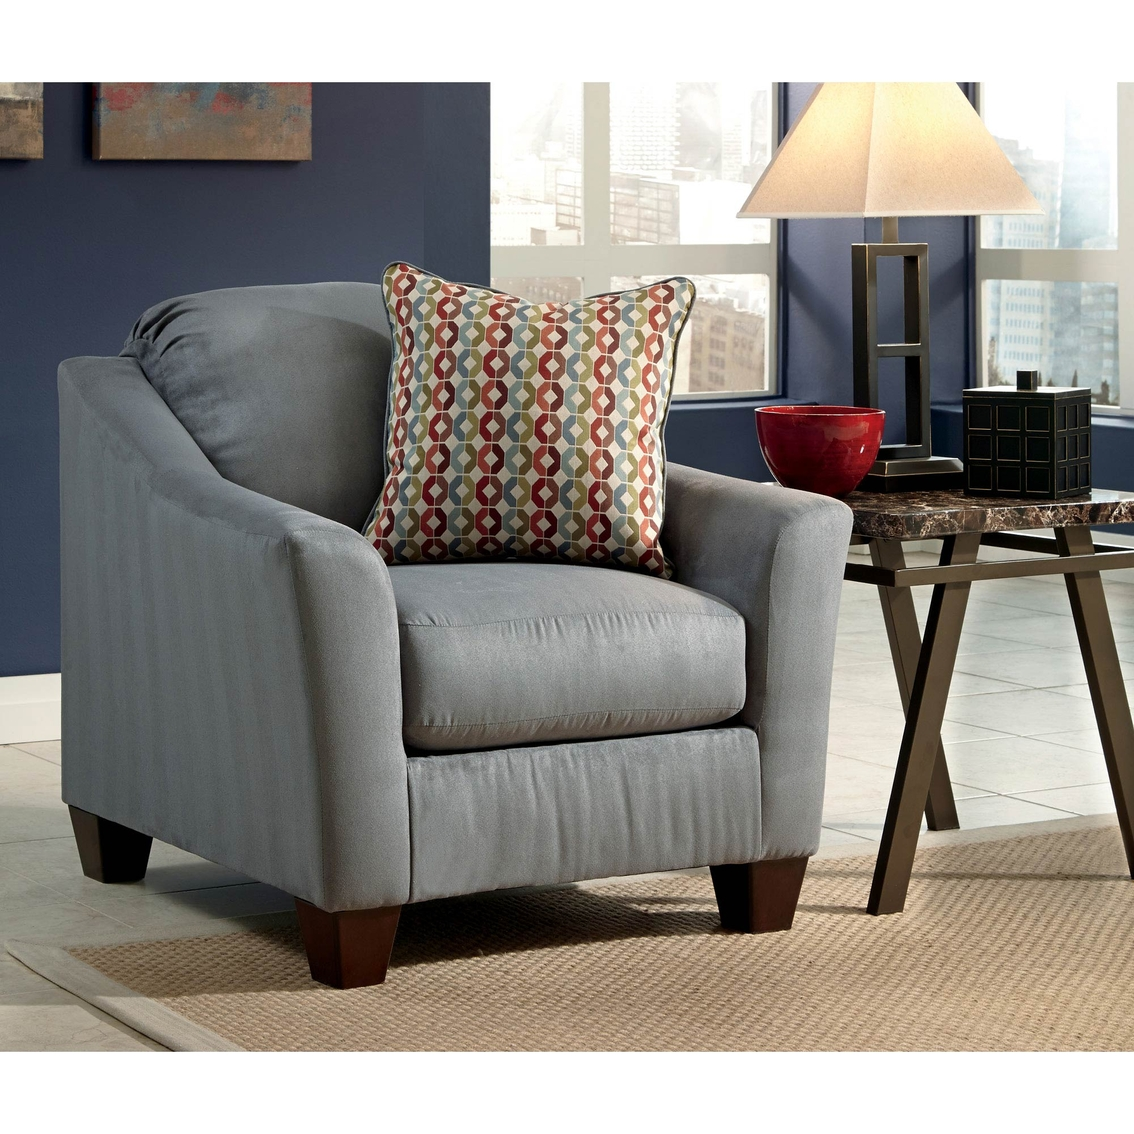 Ashley Furniture Online Shopping: Ashley Hannin Chair